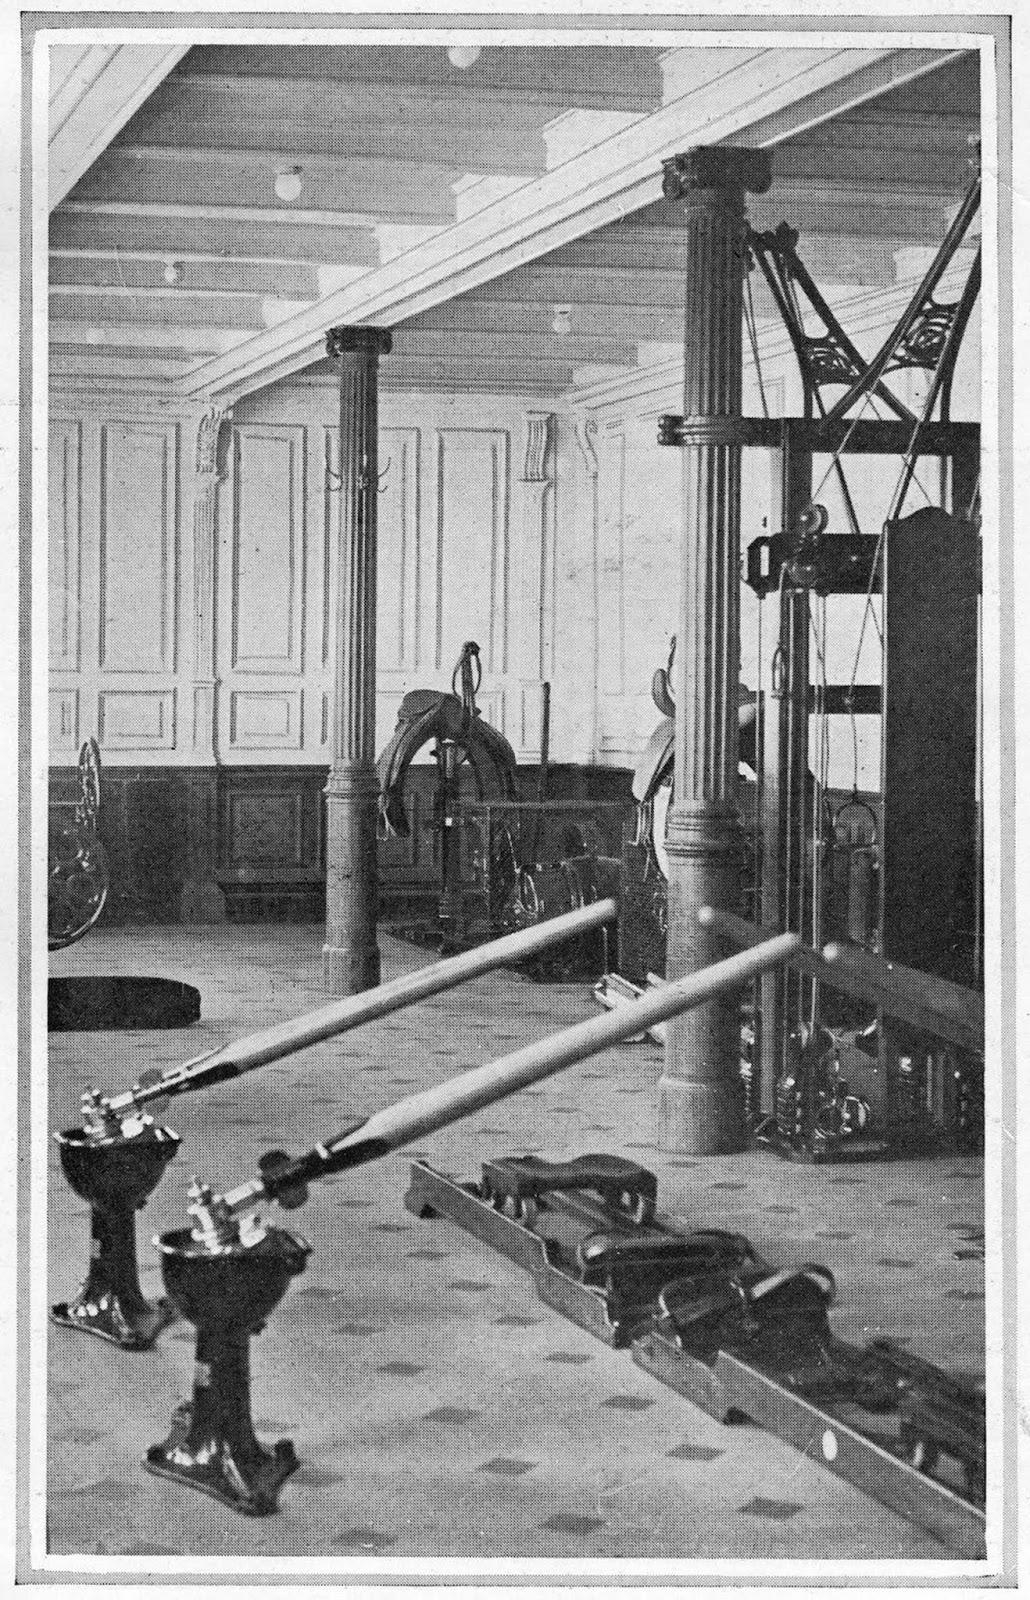 gimnasio principios s.XX